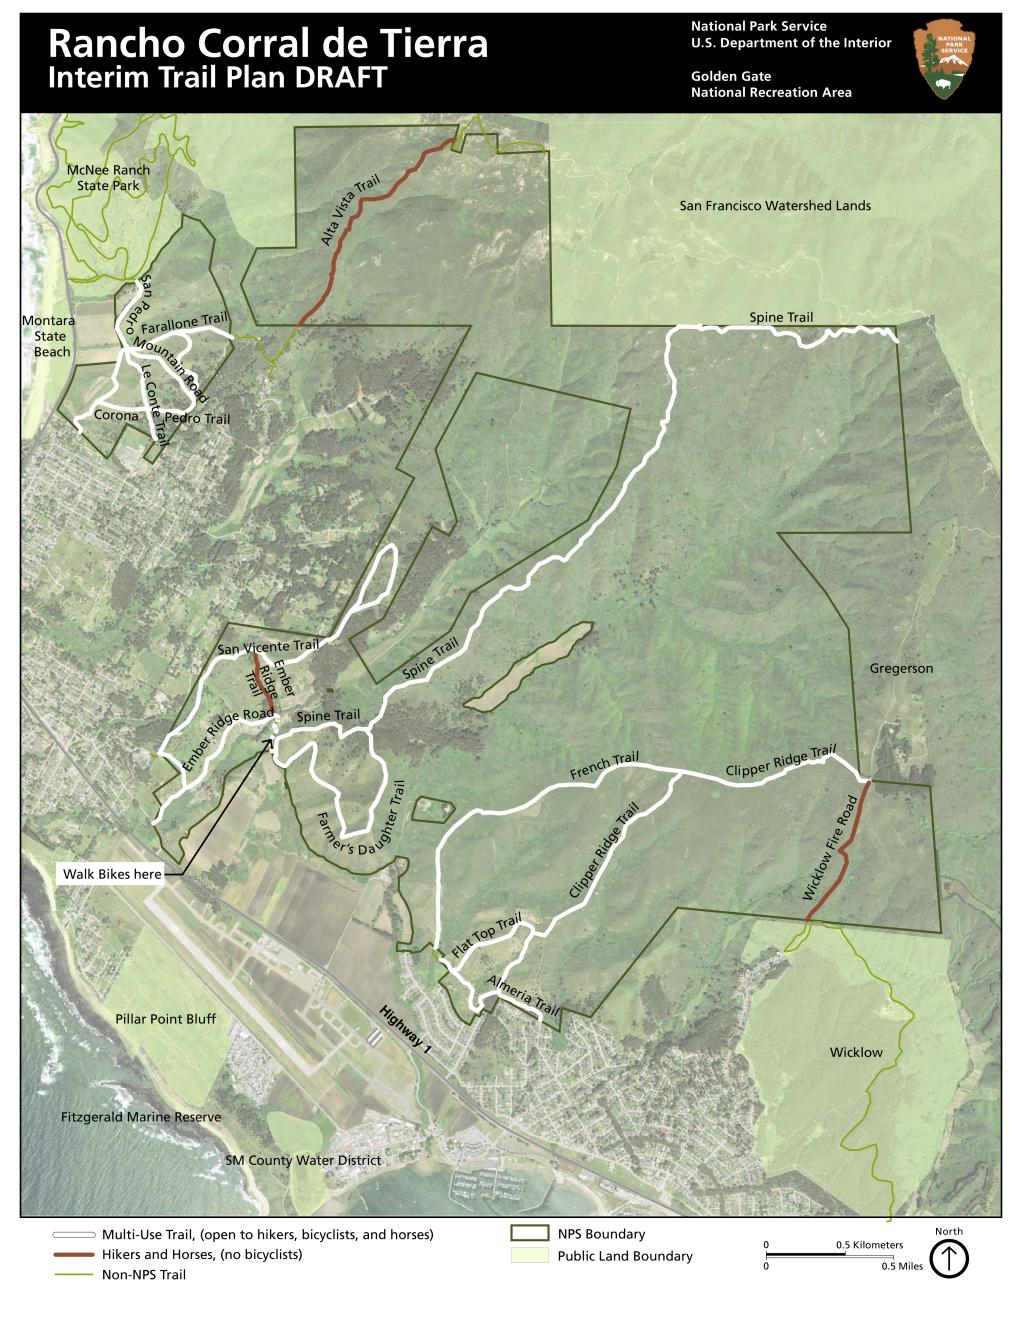 Golden Gate National Recreation Area proposes major upgrades Mtbrcom